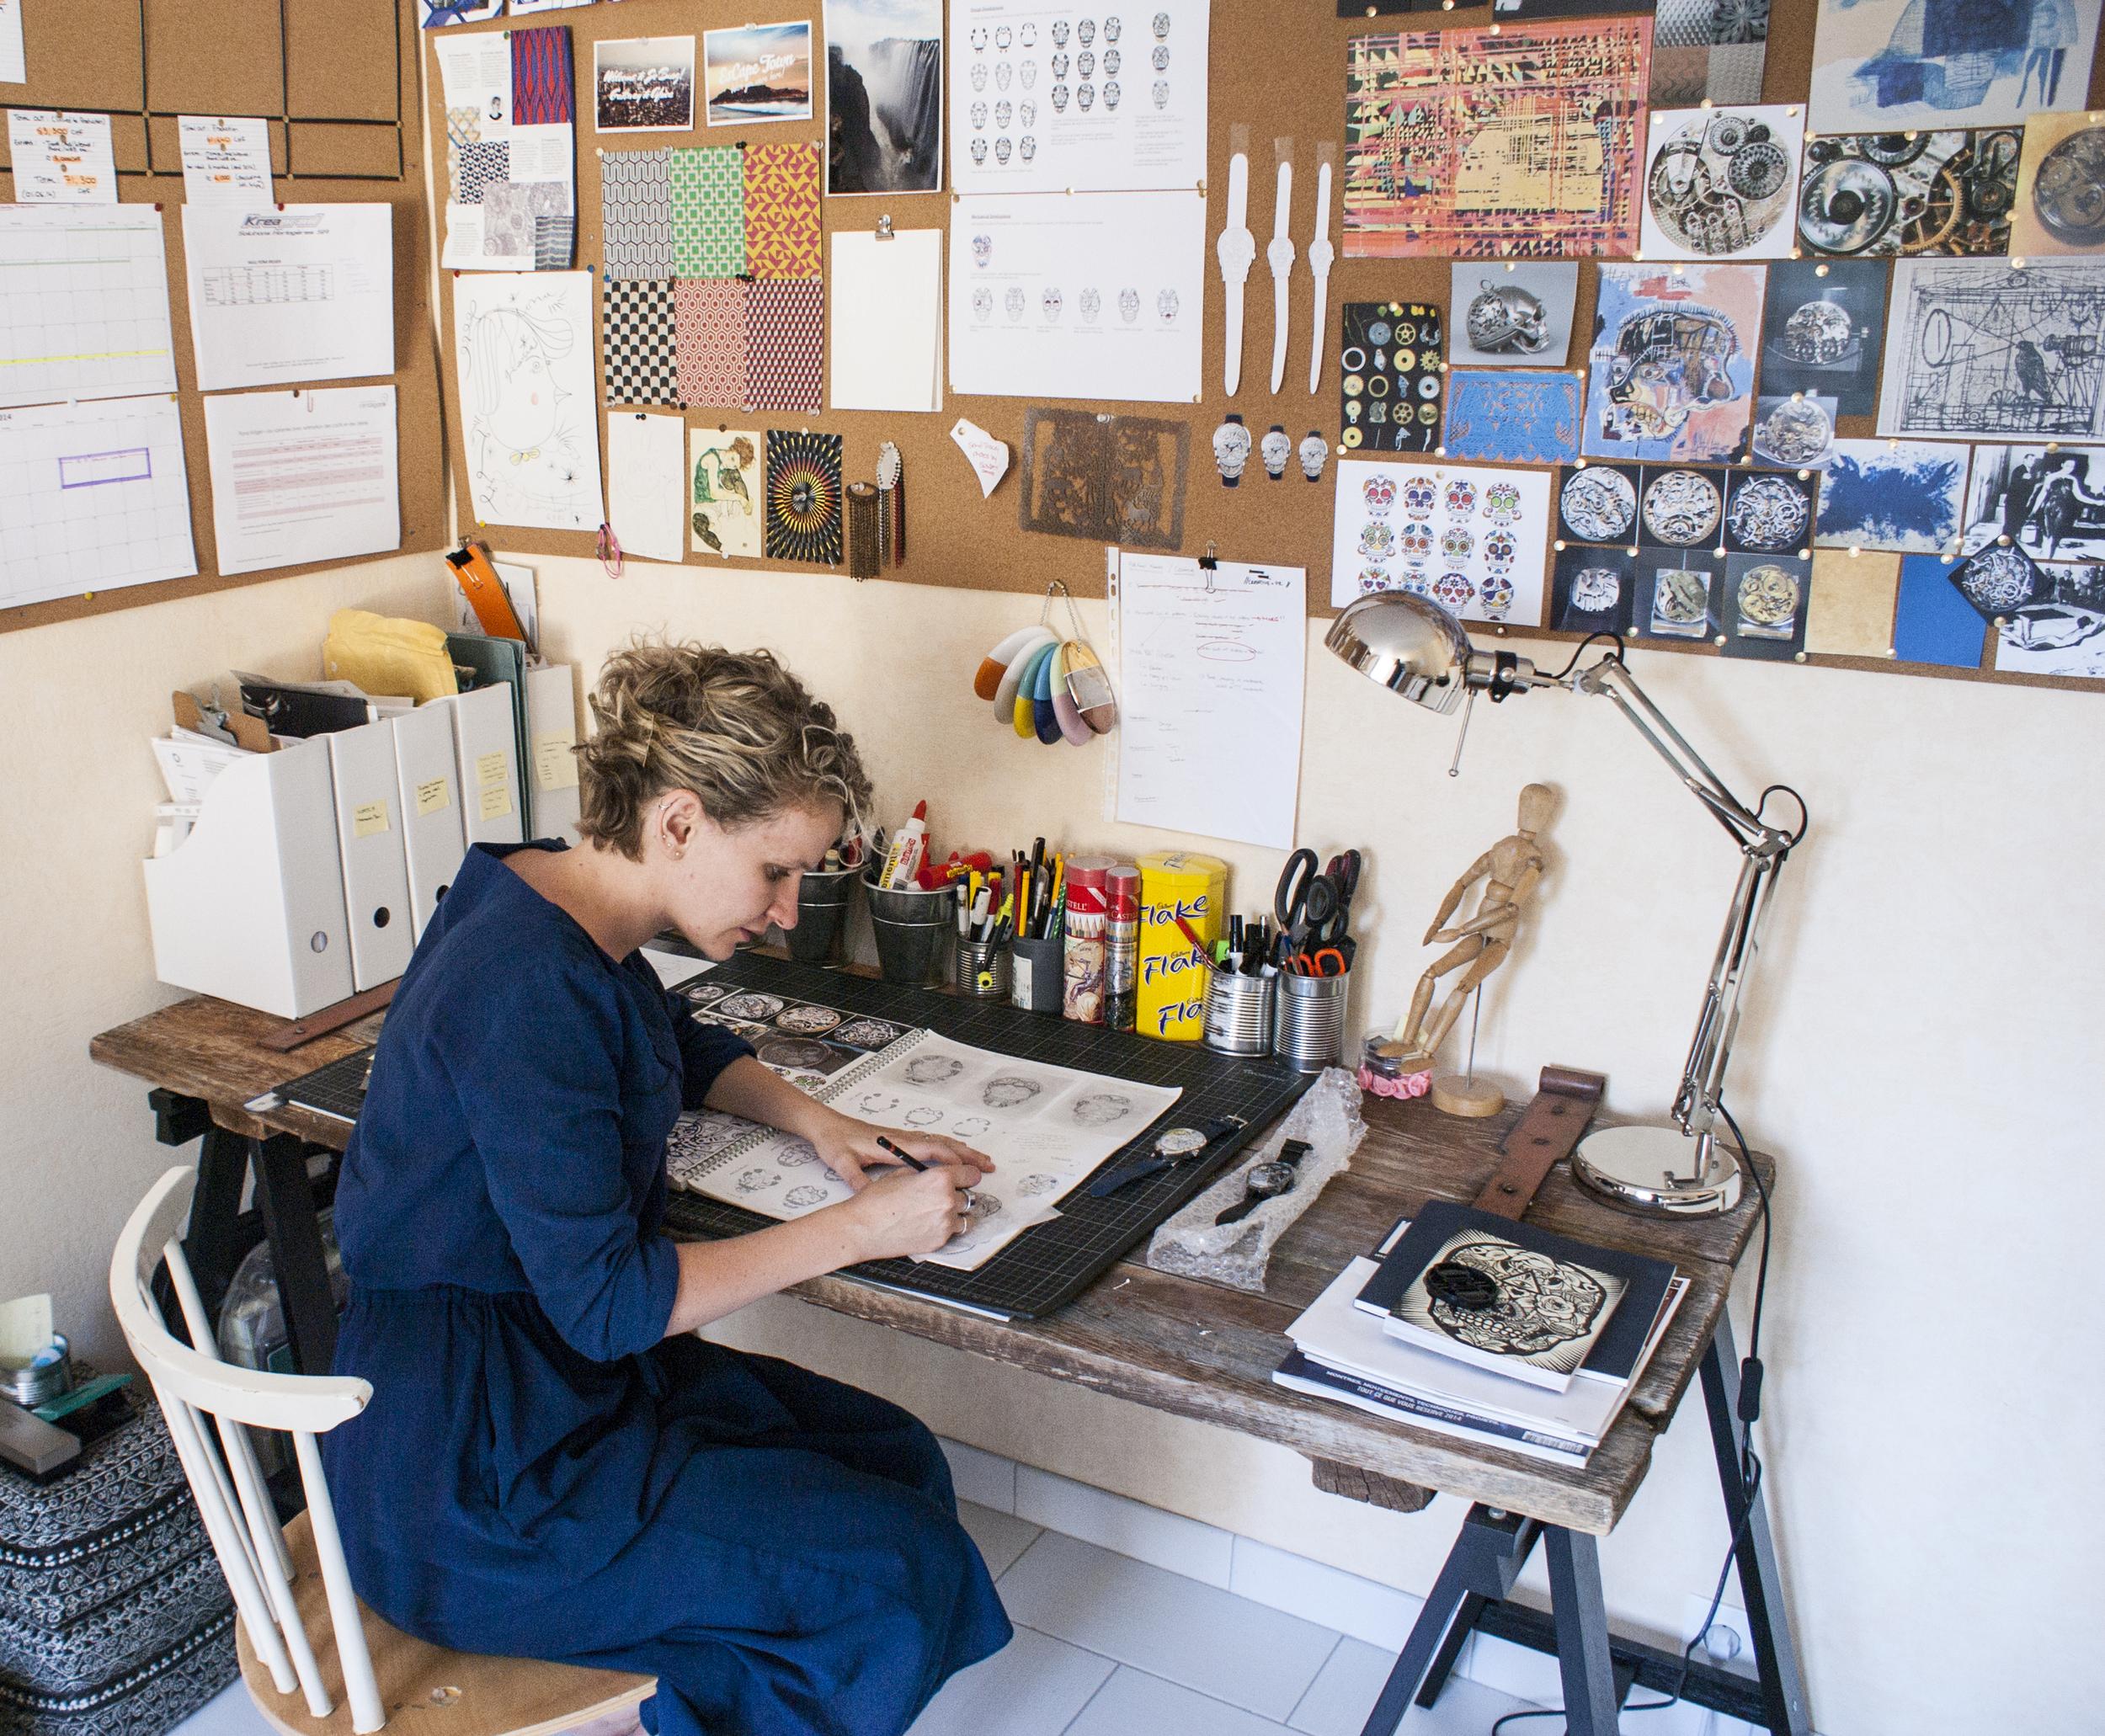 Fiona Krüger hand sketching her designs.